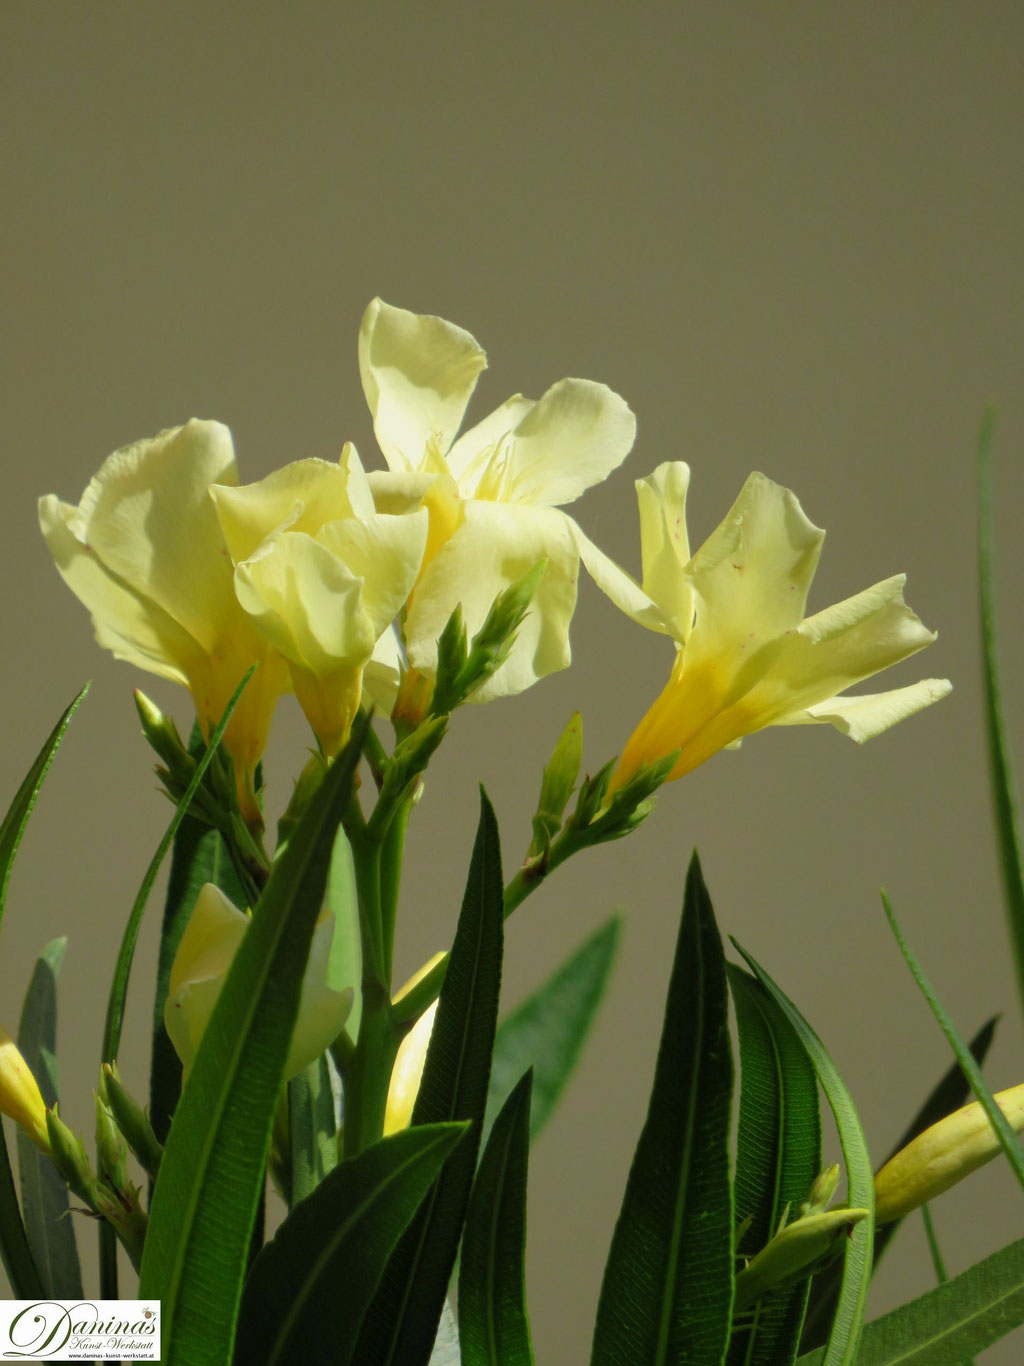 gelb blühender Oleander im Sommer